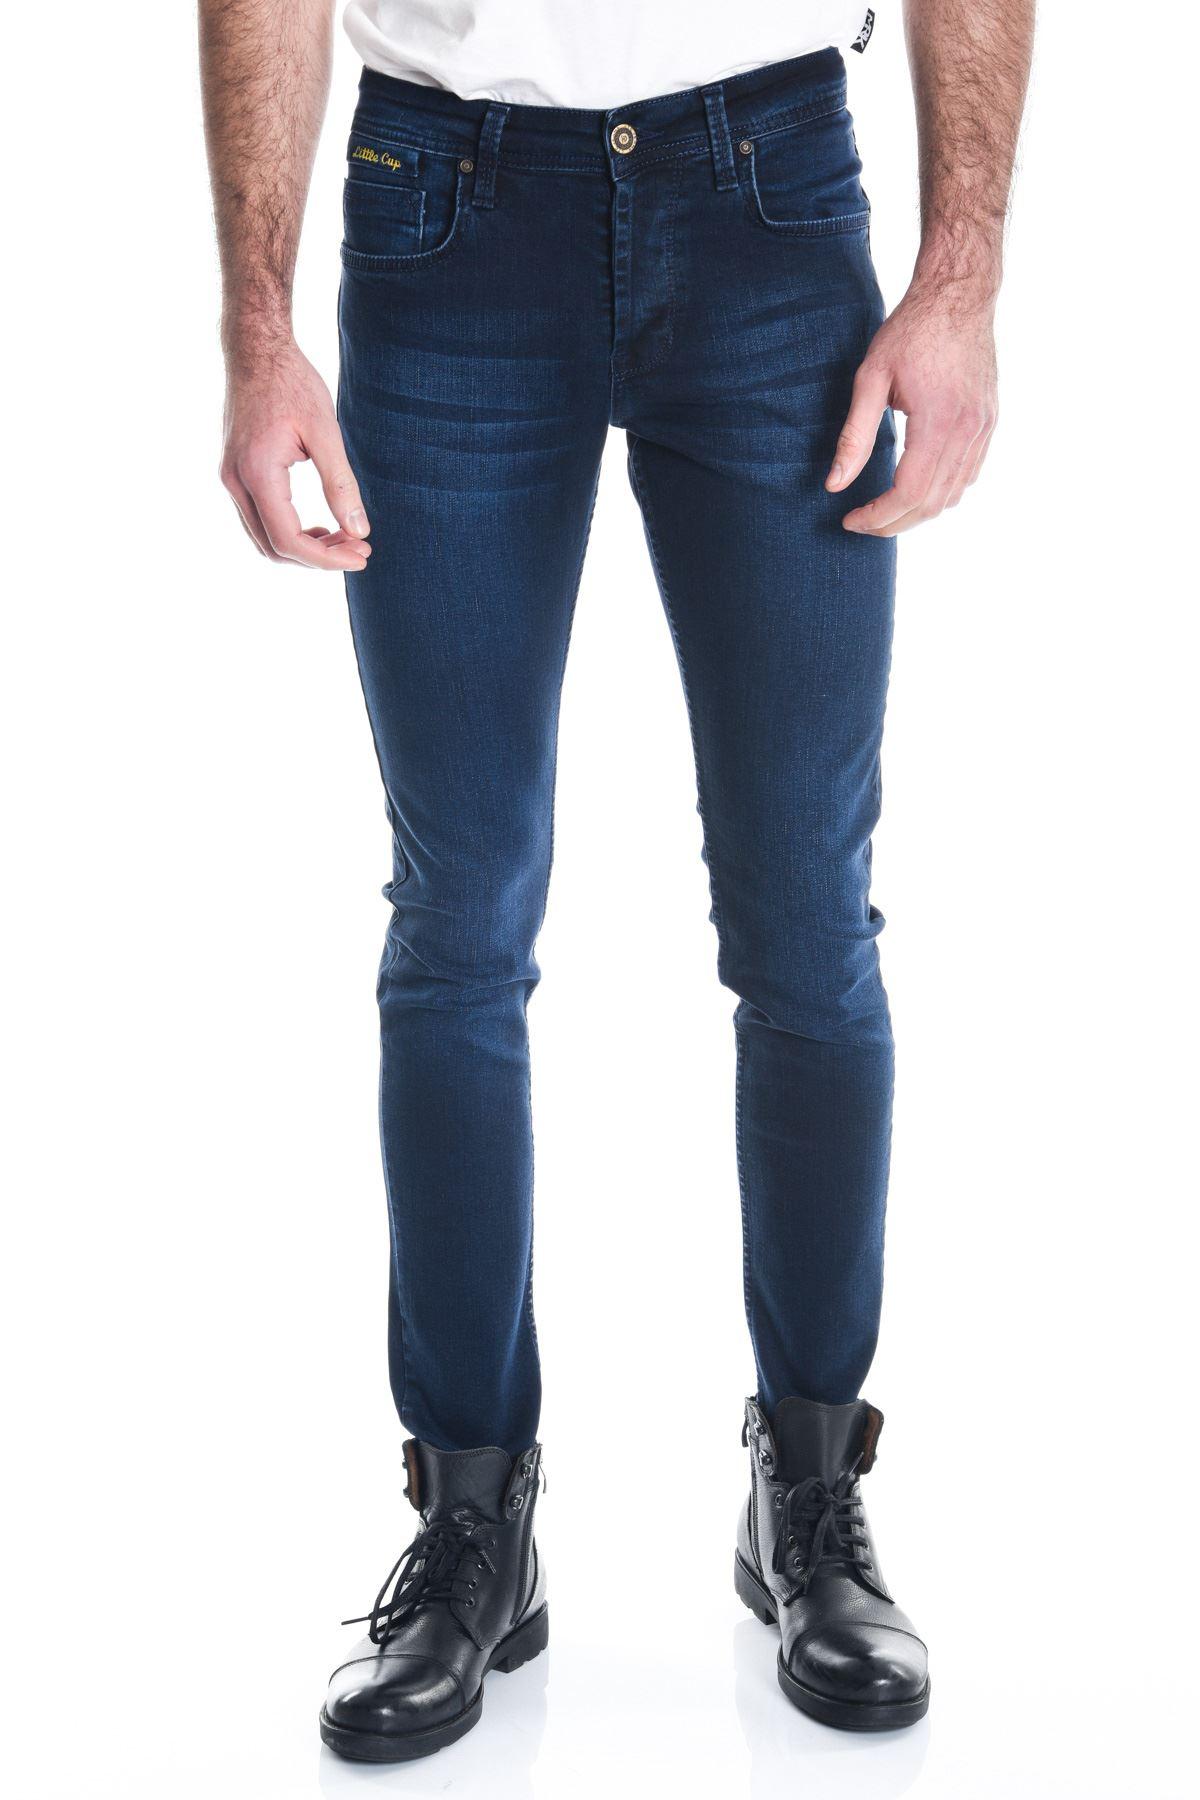 Lacivert Taşlamalı Erkek Kot Pantolon